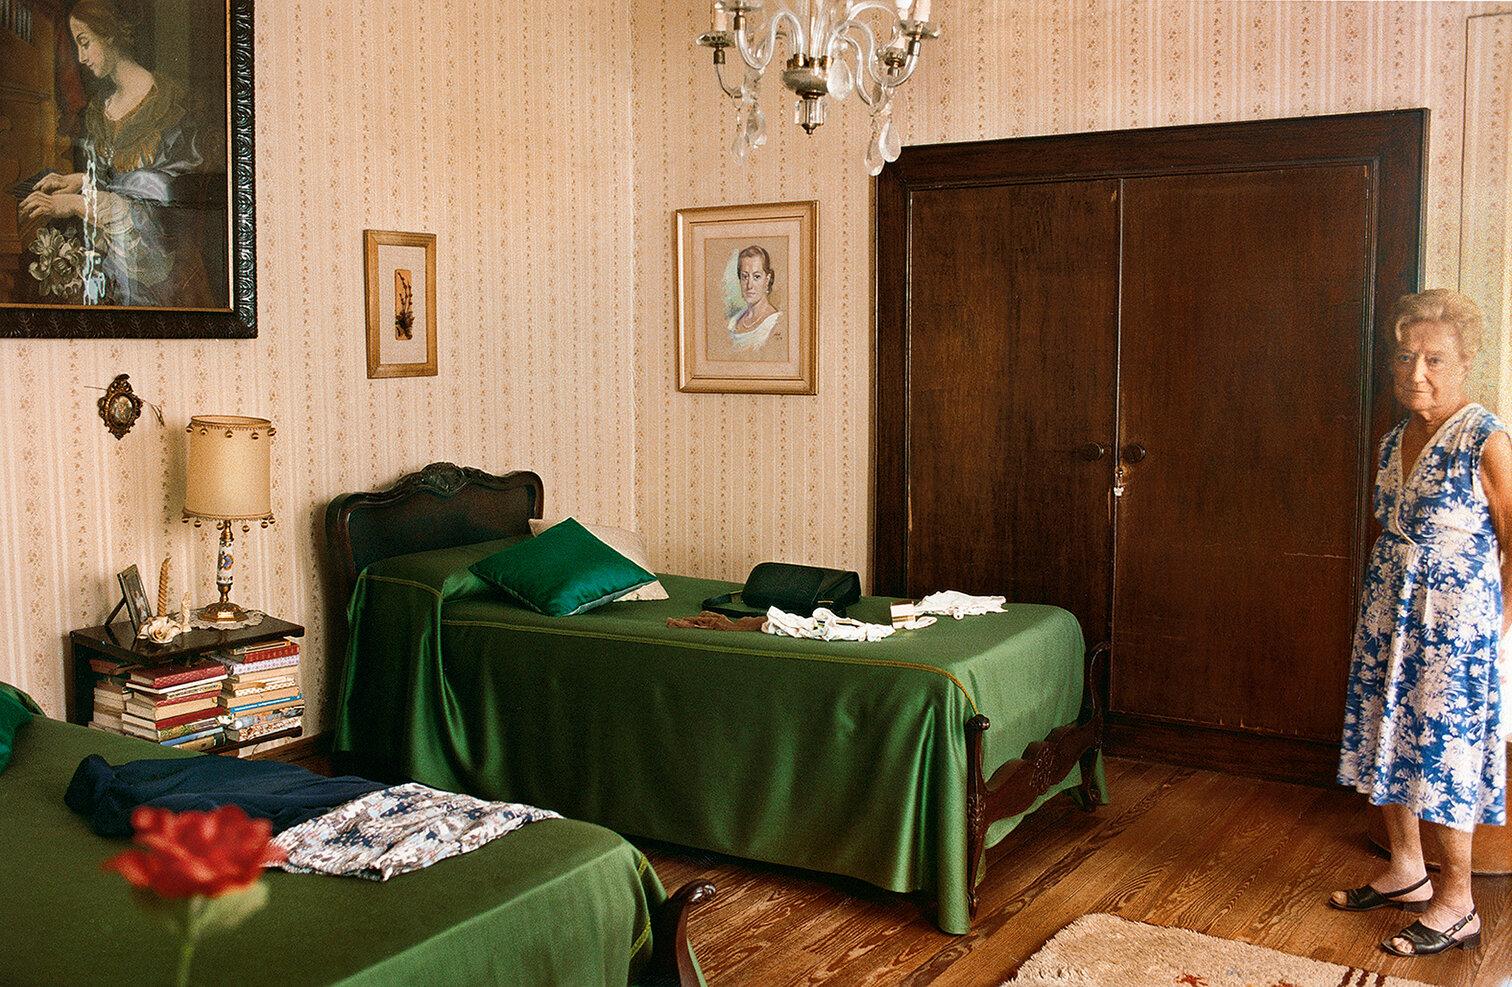 20 Habitacion de la Negra-Negra´s bedroom 2000 copia.jpg